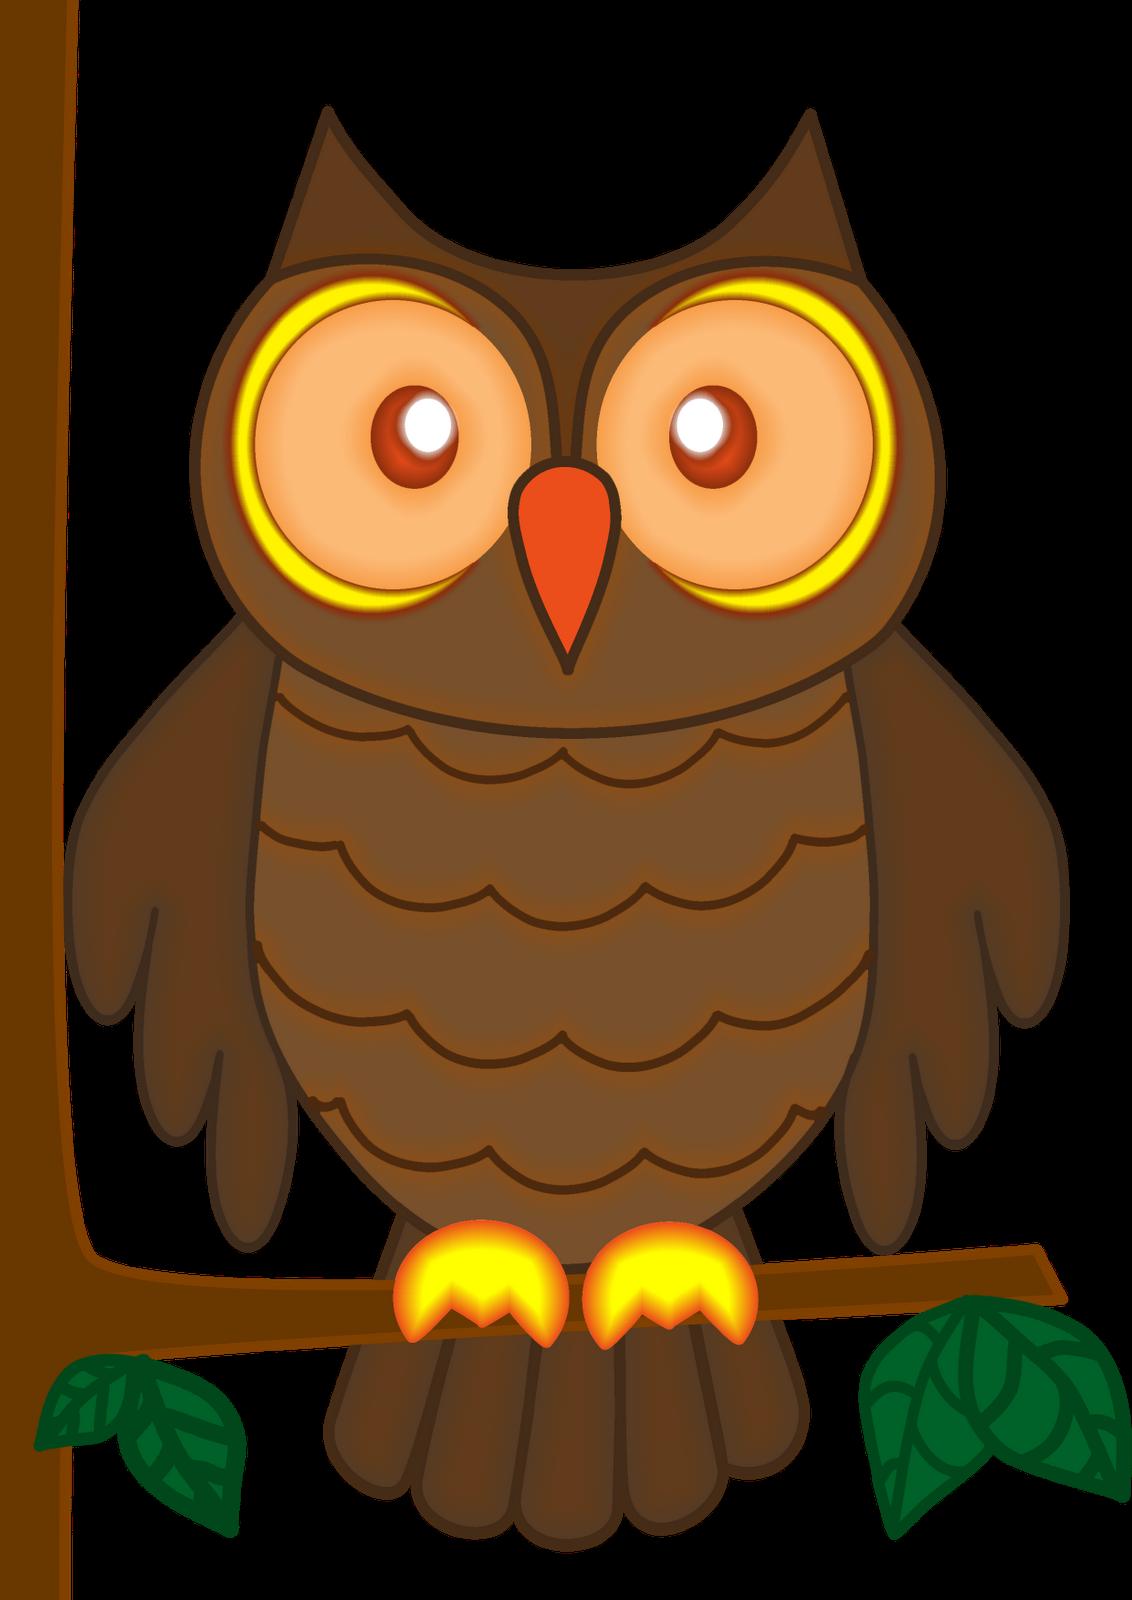 Wise Owl Clip Art - ClipArt Best